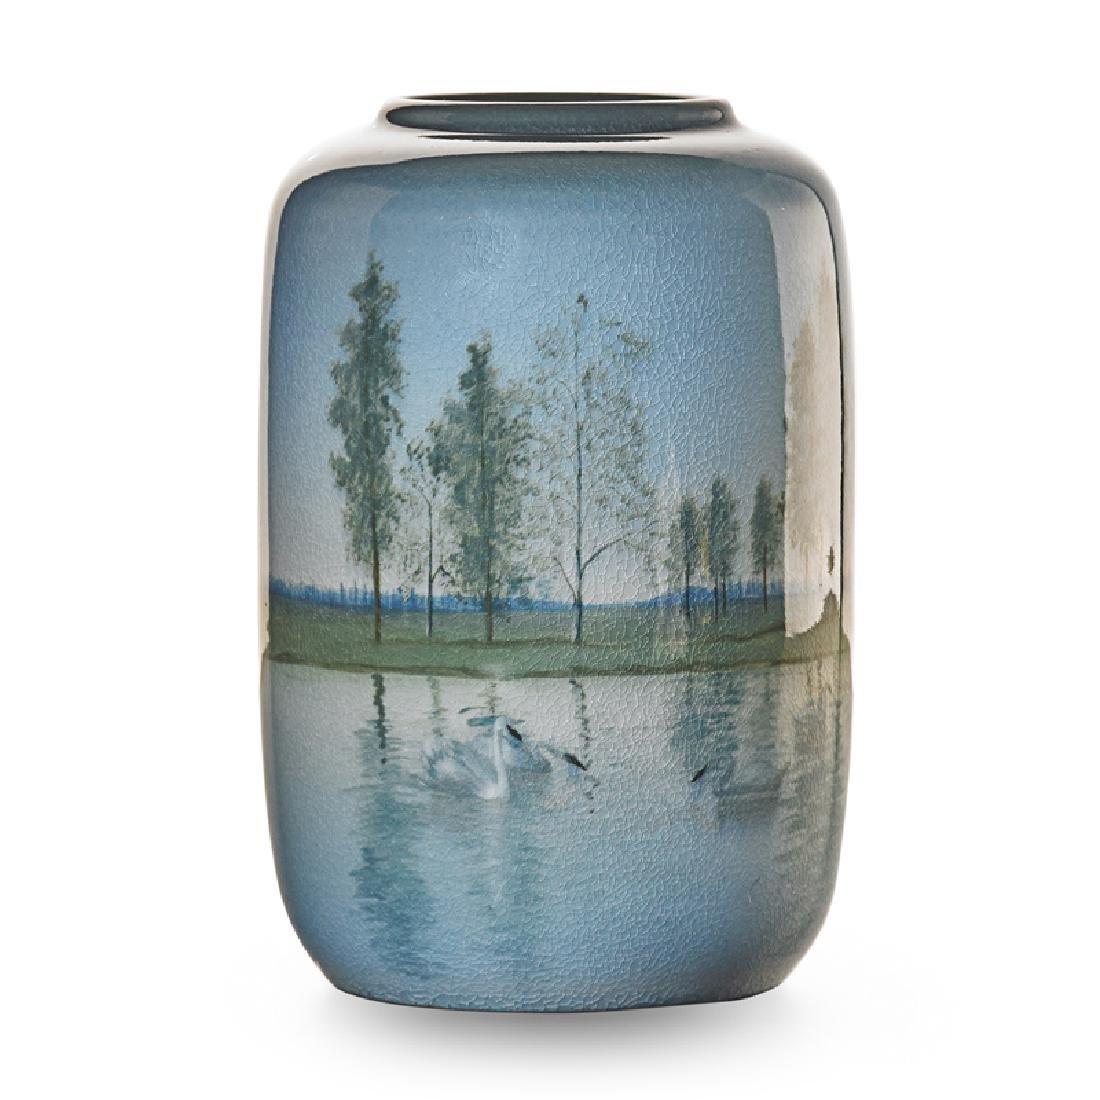 C. SCHMIDT; ROOKWOOD Rare Iris Glaze vase